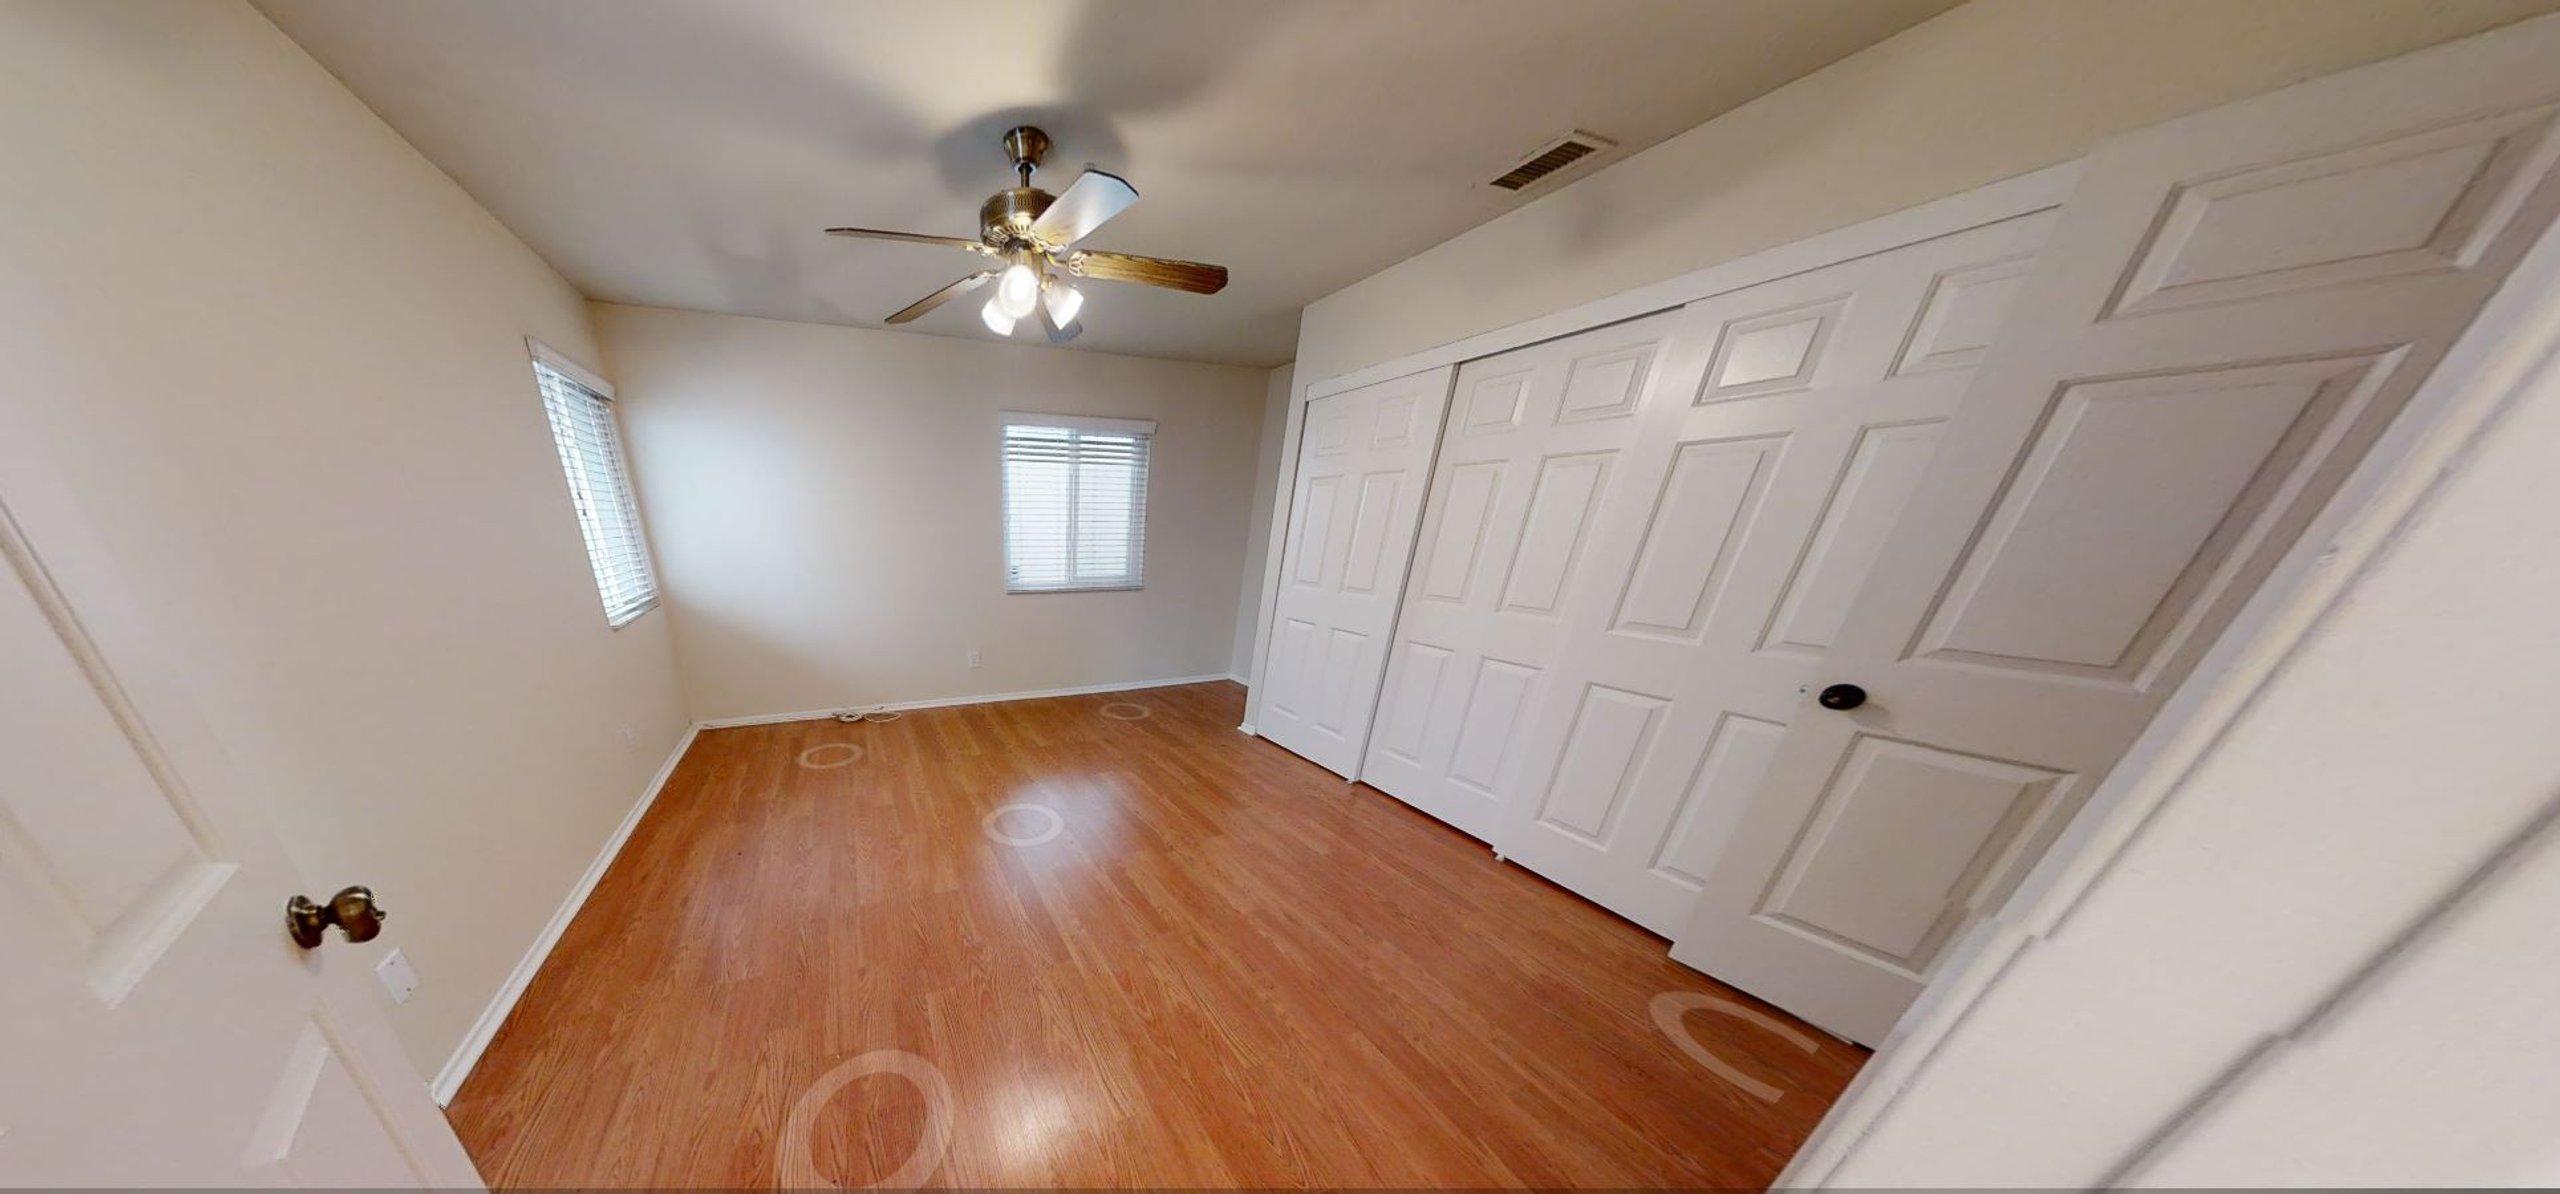 13x14 Bedroom self storage unit